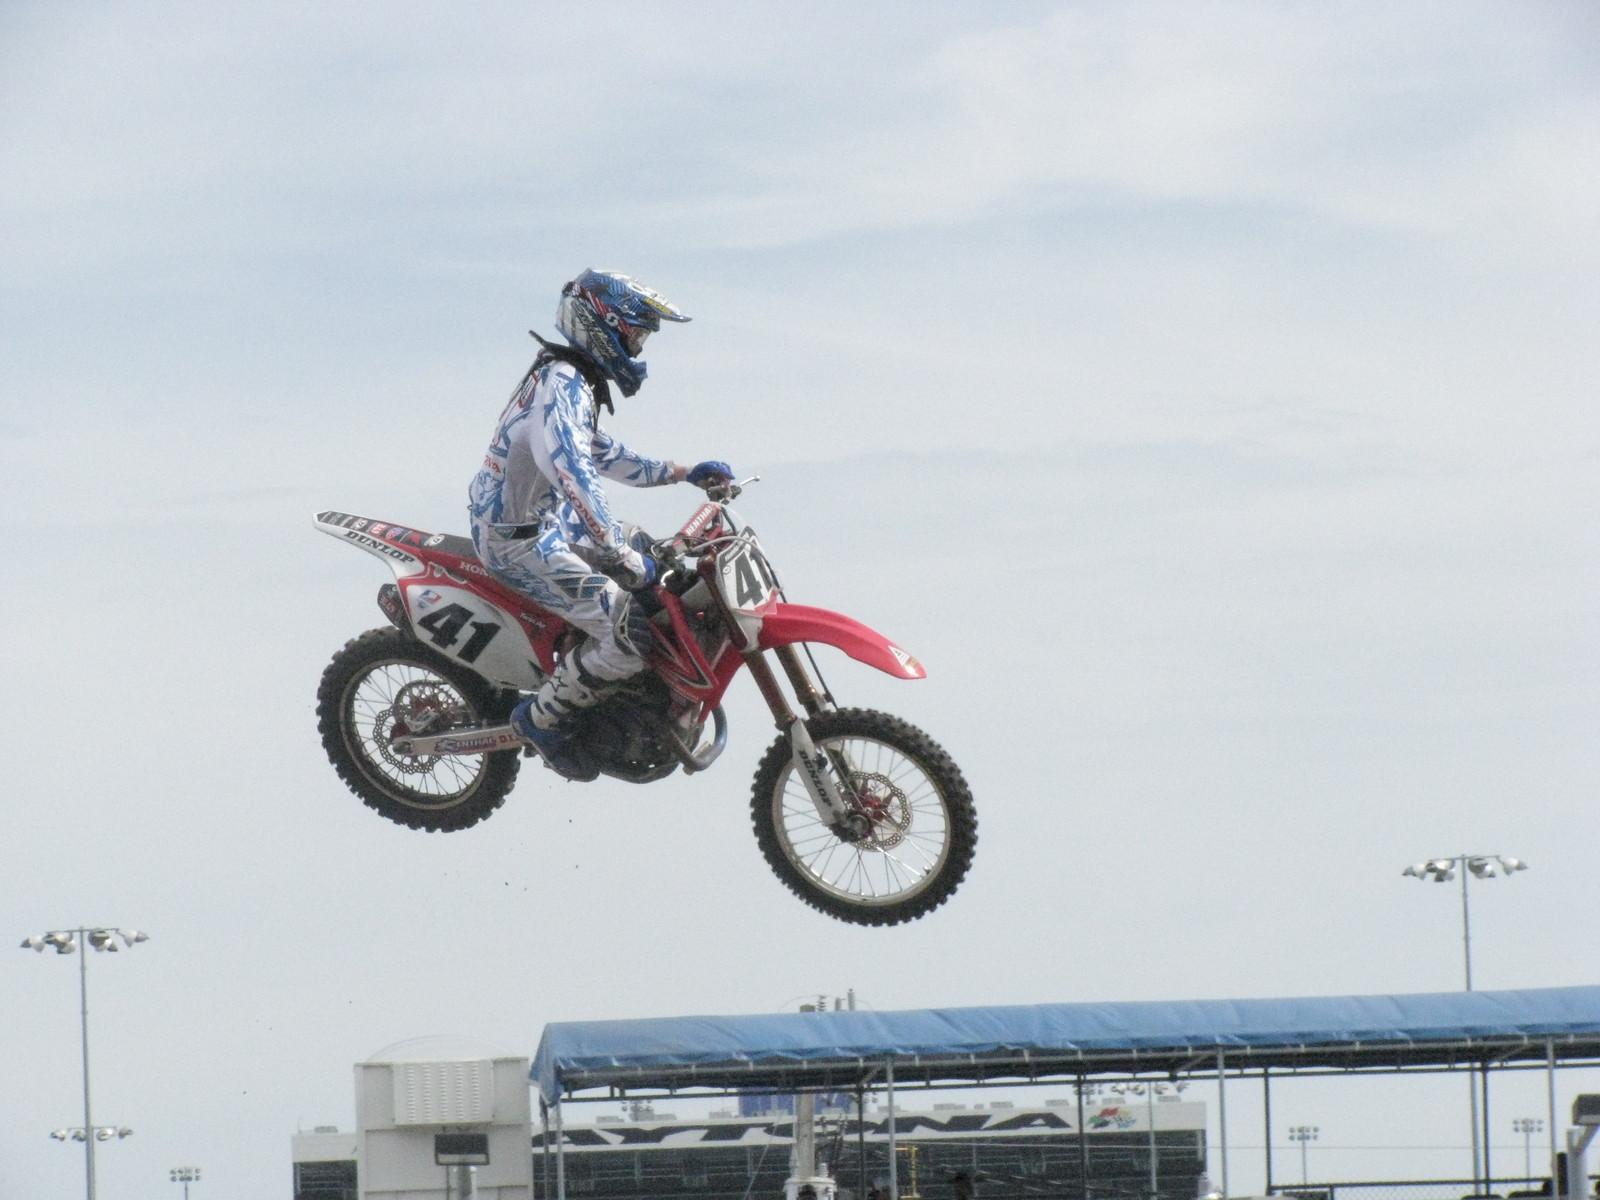 IMG 0524 - MxPro318 - Motocross Pictures - Vital MX